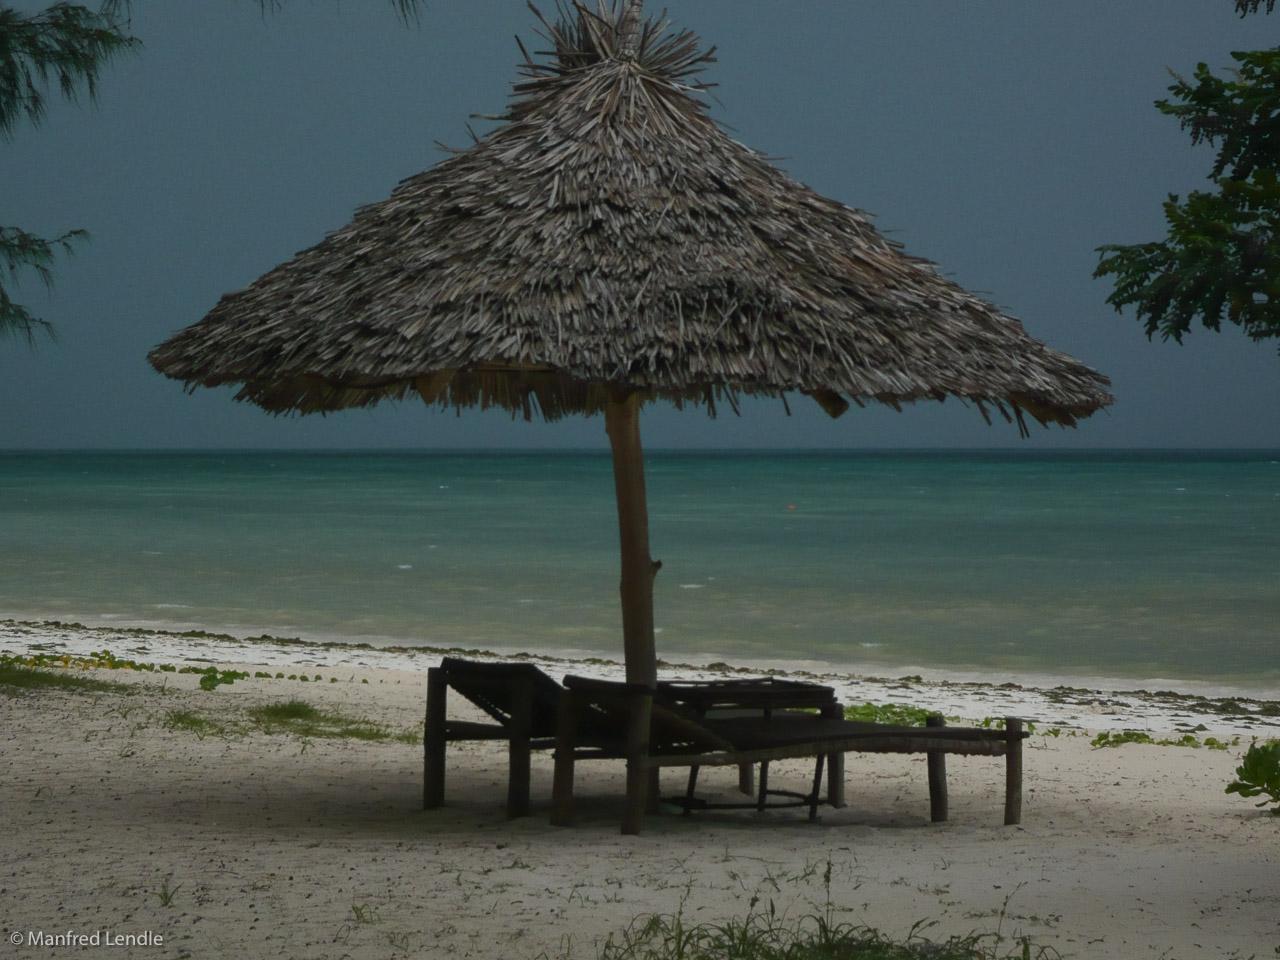 Tanzania_2009-1070466.jpg